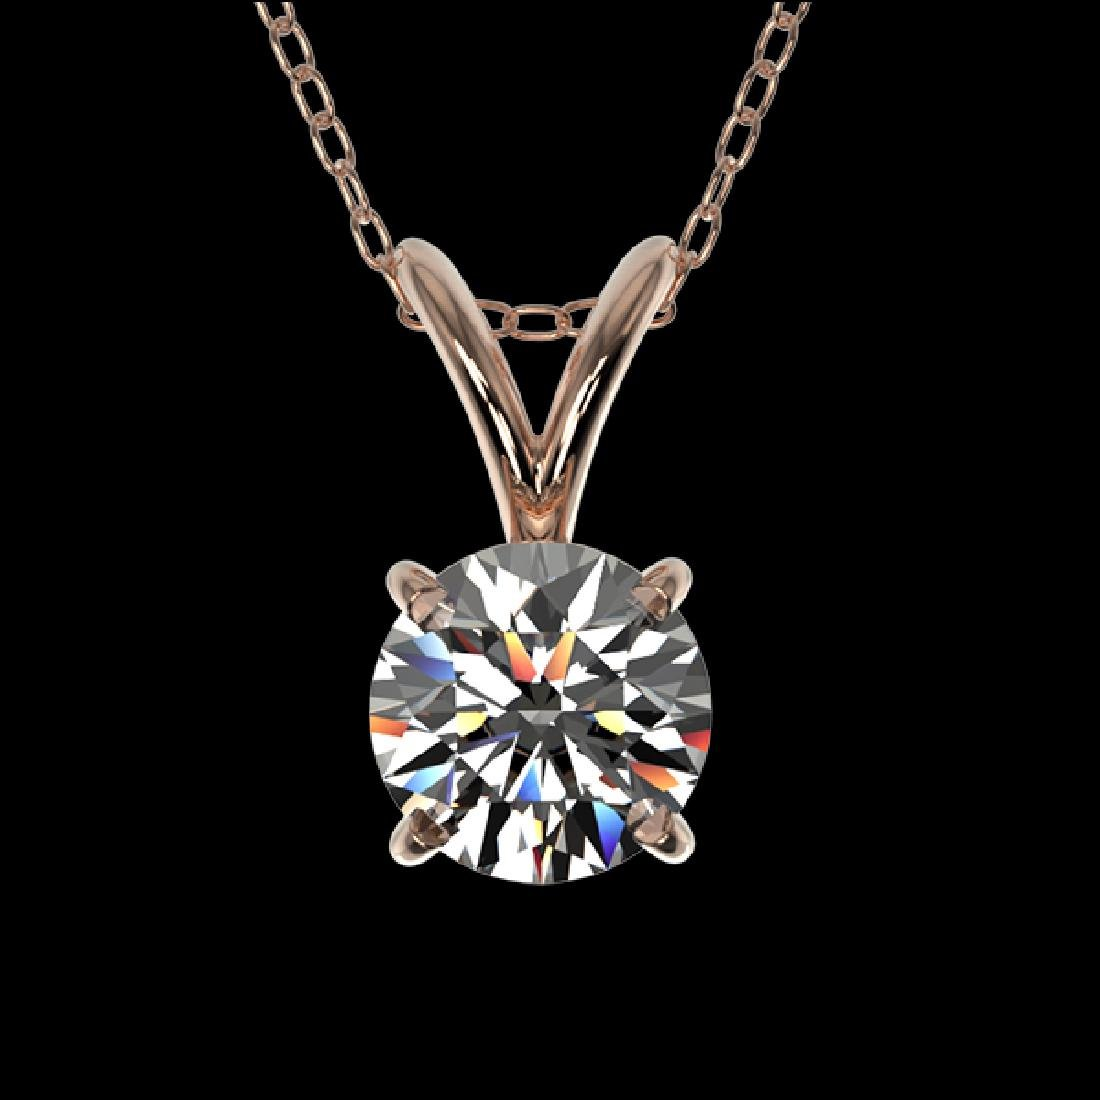 0.51 CTW Certified G-Si Quality Diamond Bridal